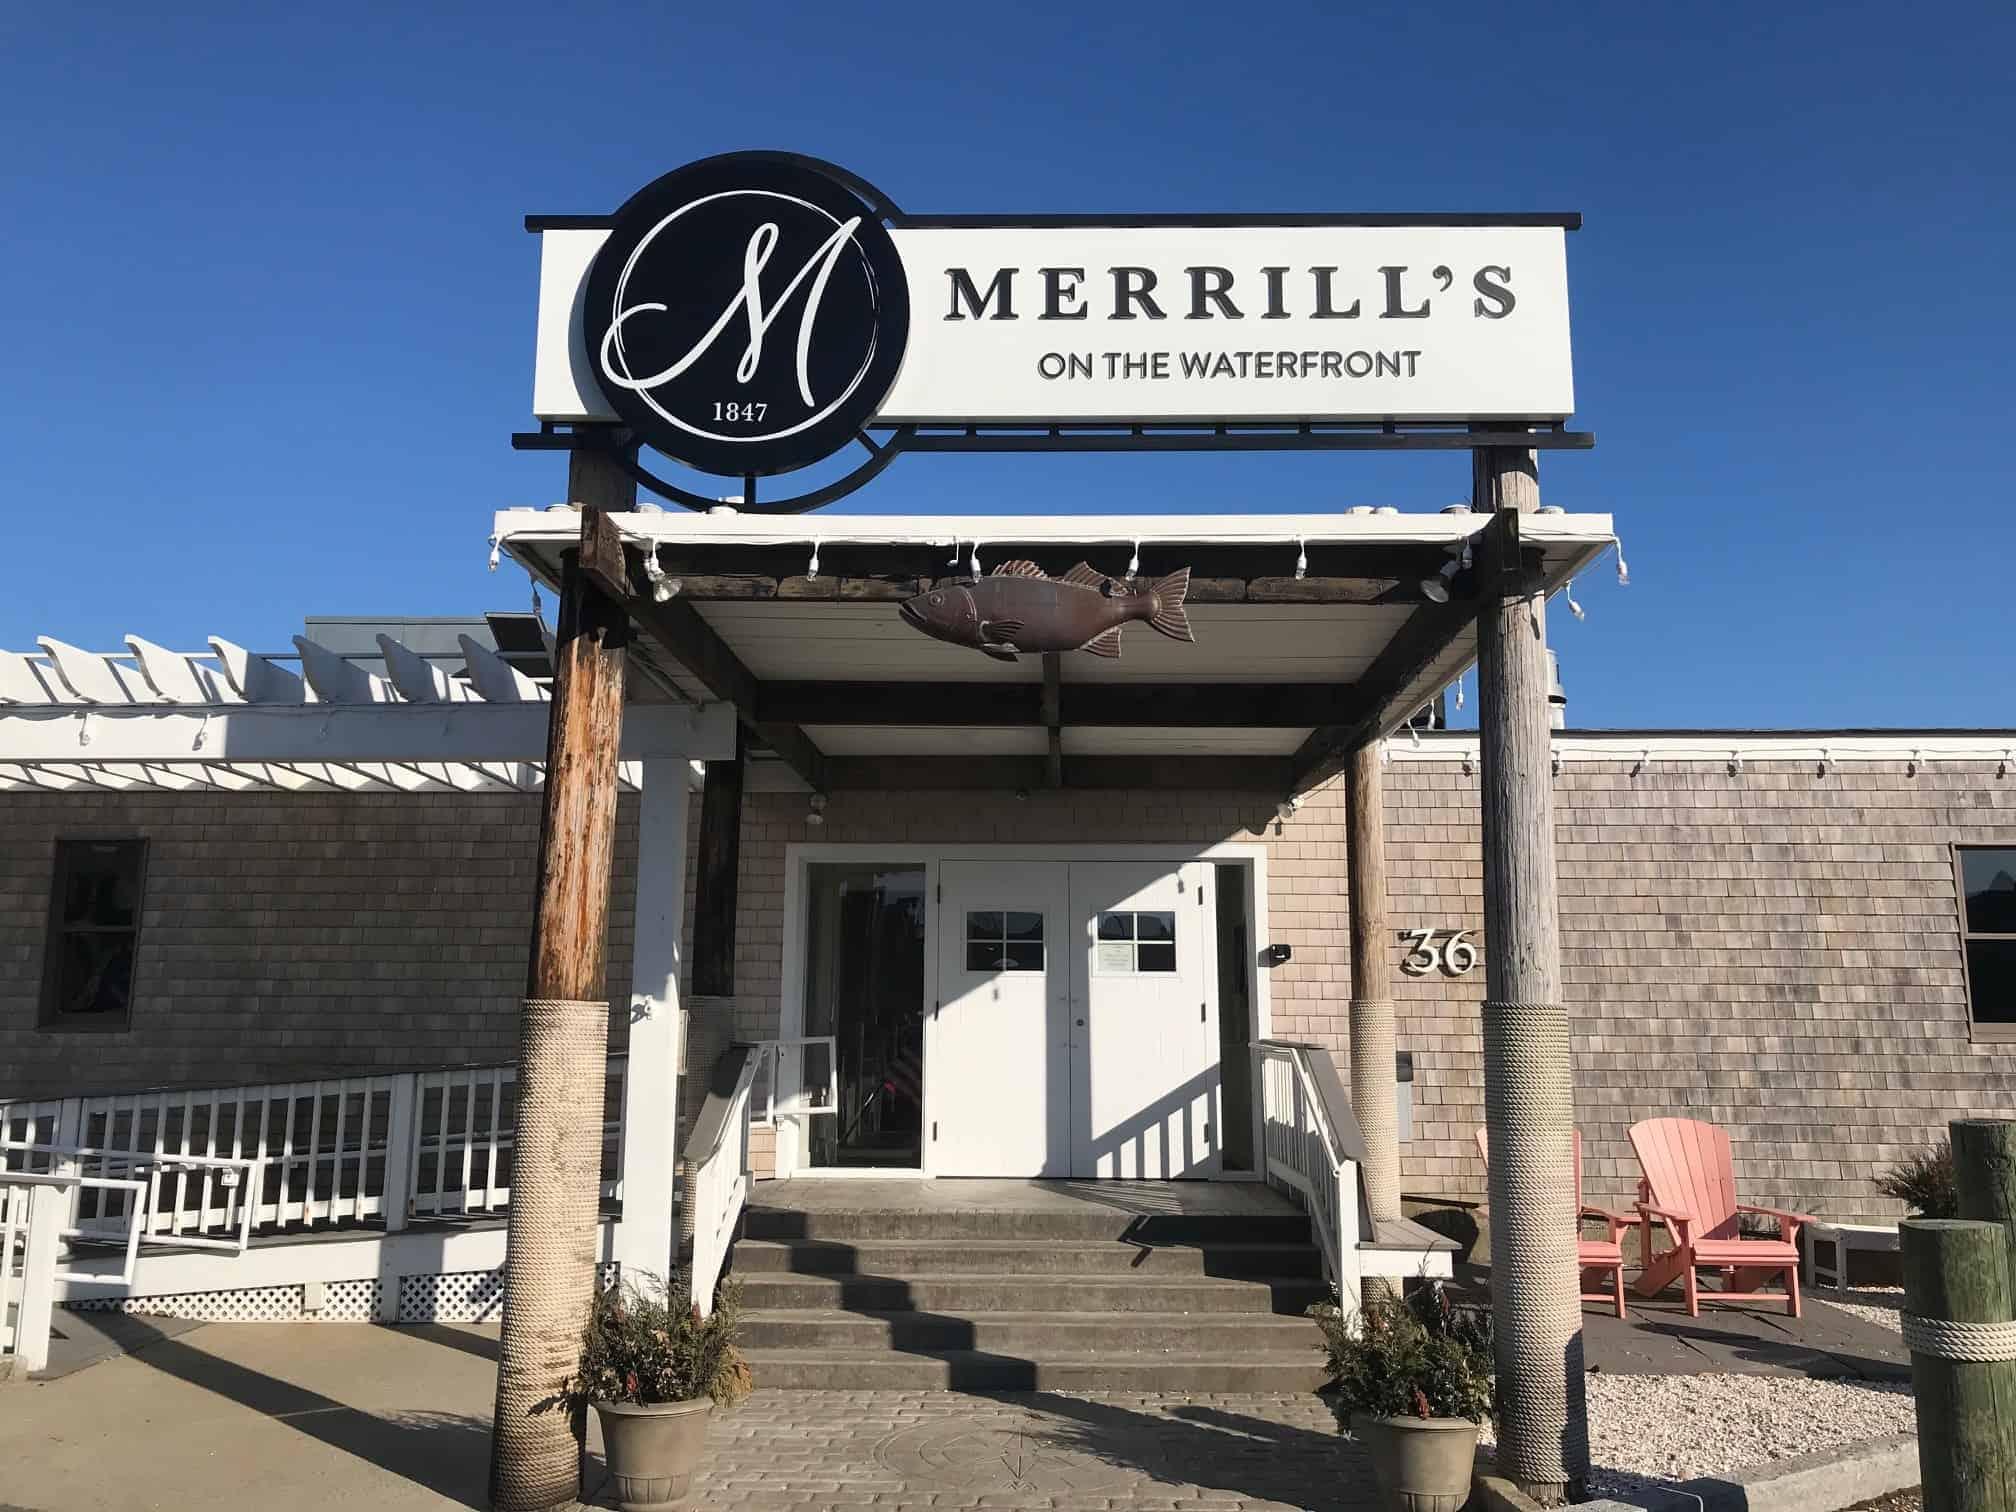 Merills Roof Sign 1